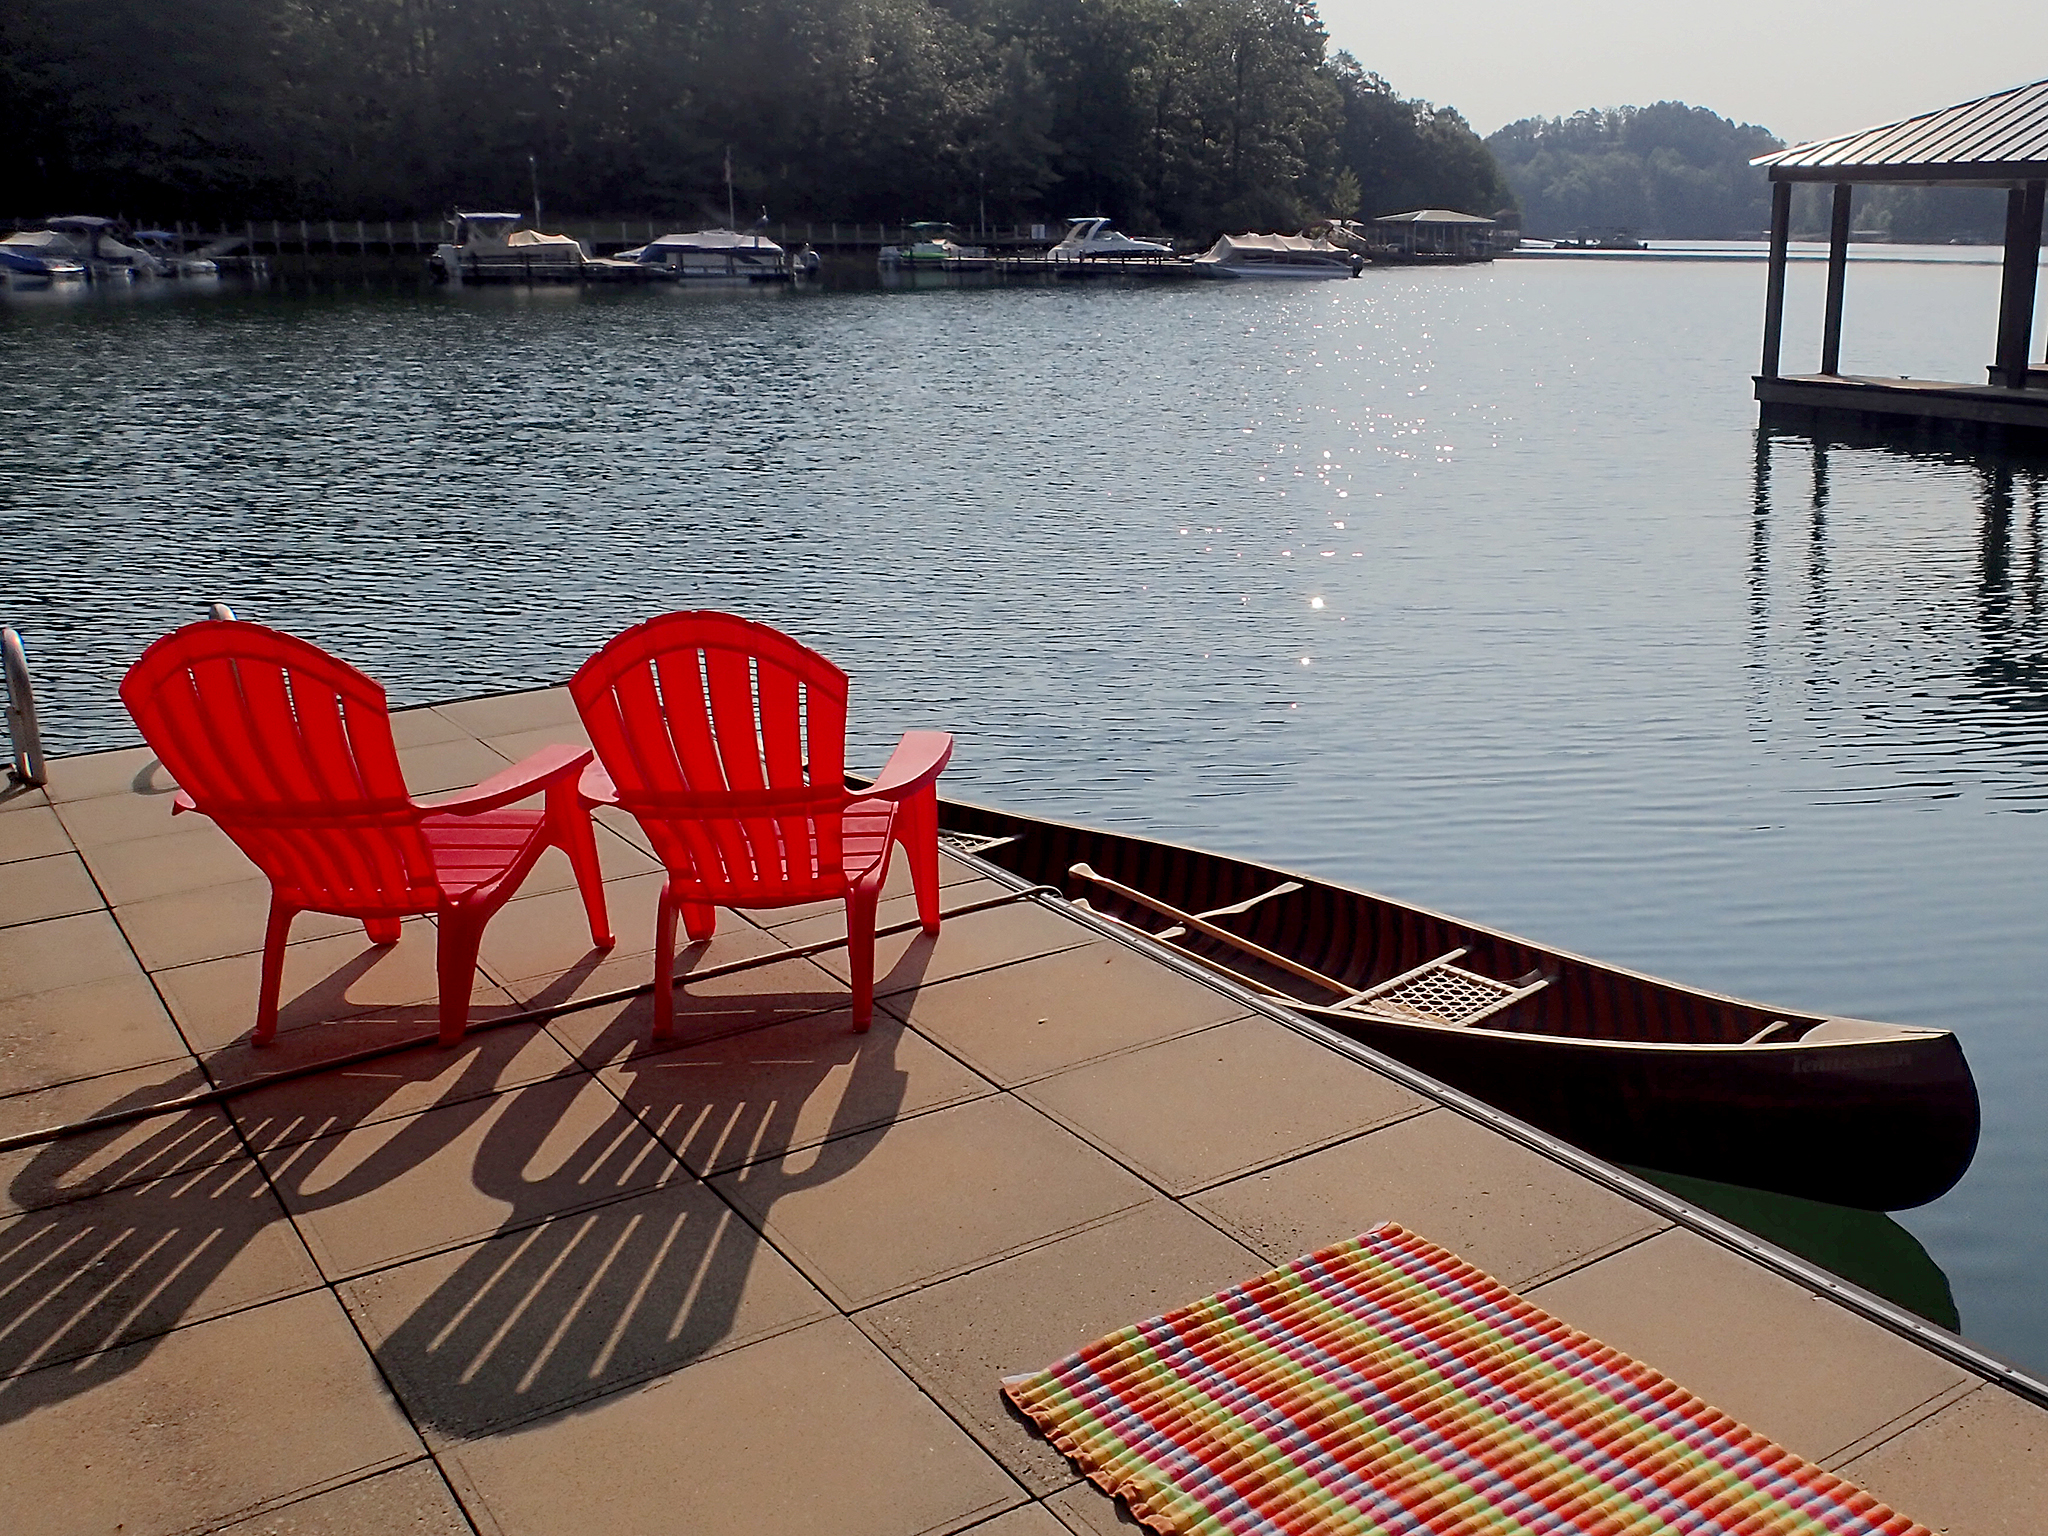 Lake Keowee Real Estate Expert Blog Come on Spring!